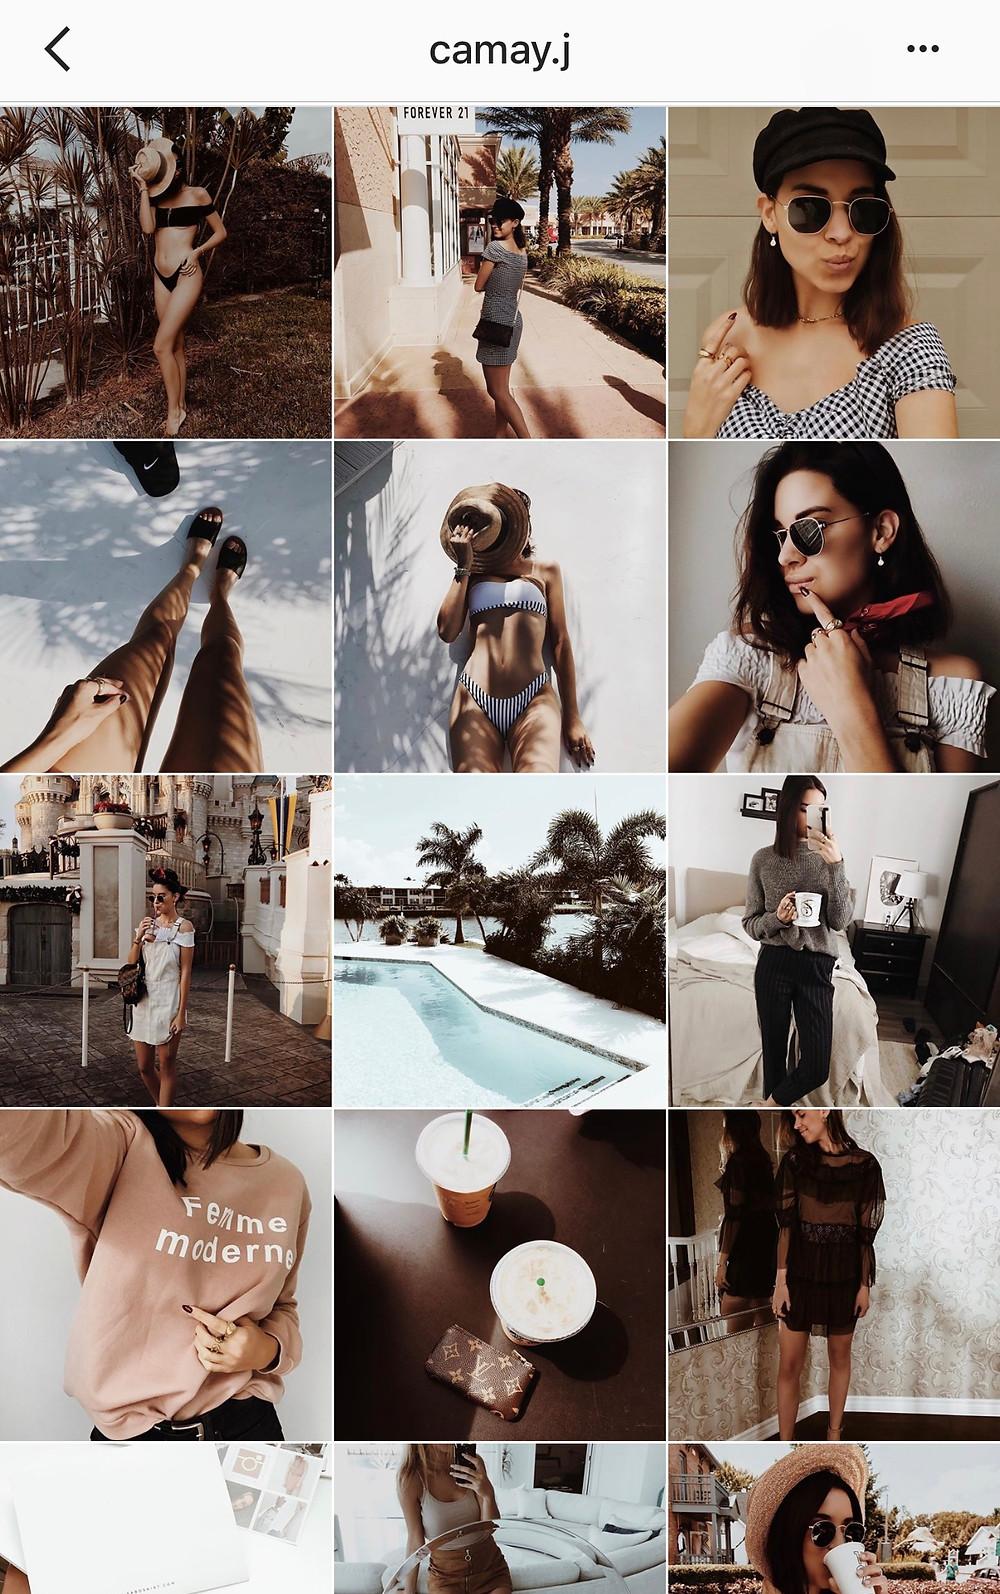 Camay.j sur Instagram